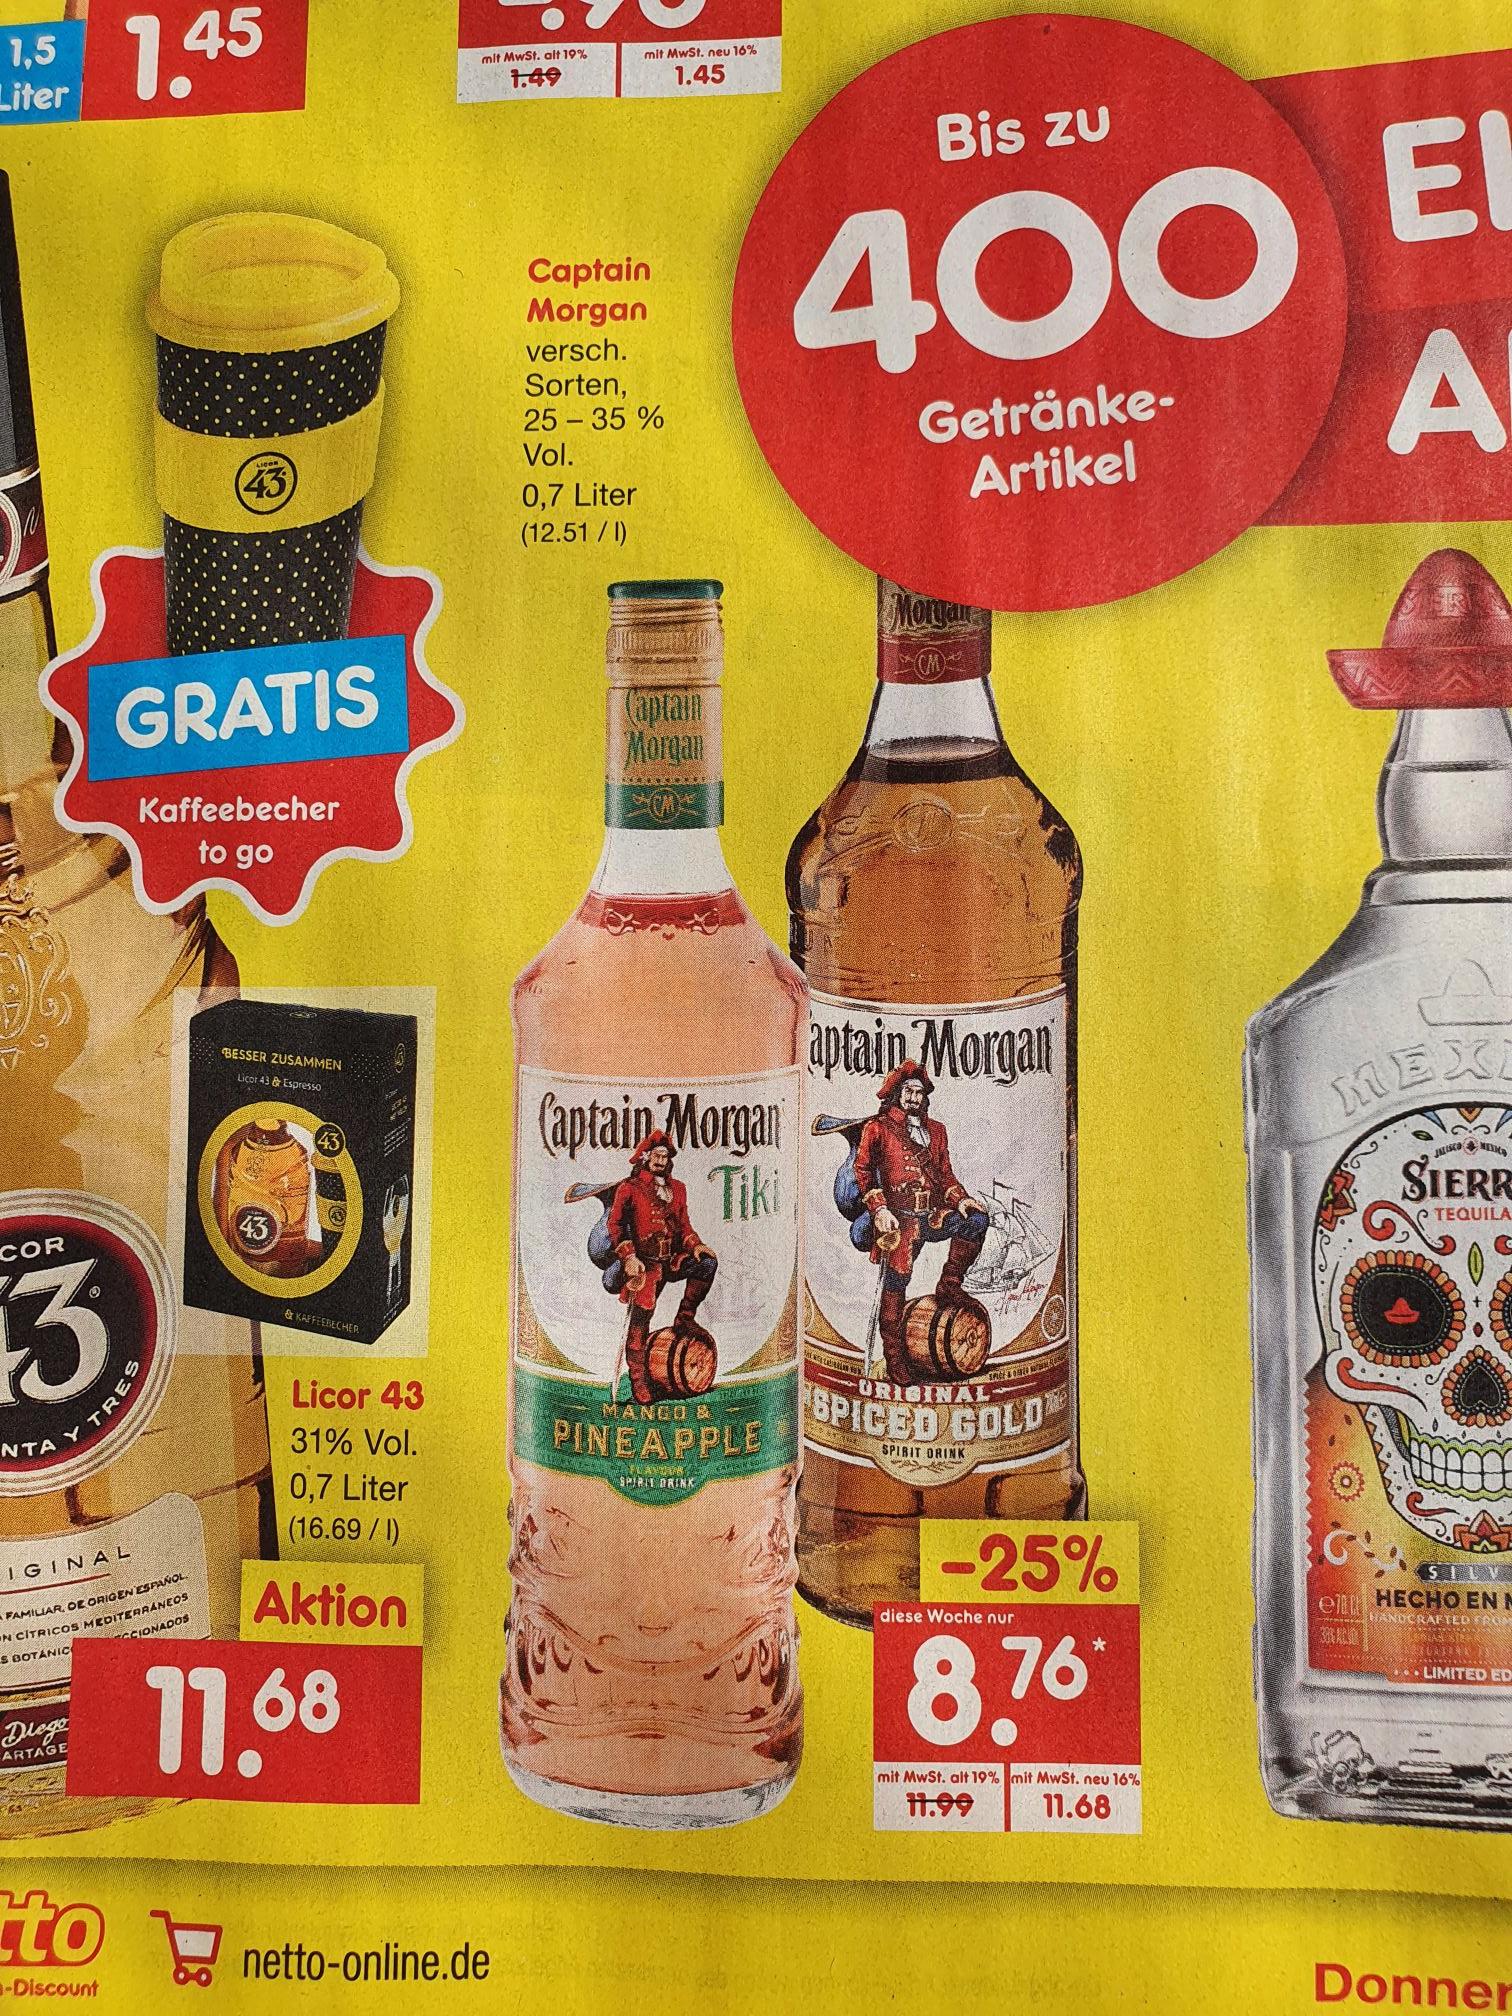 [Lokal BaWü/NRW - Netto ohne Hund] Captain Morgan Tiki Mango&Pineapple / Spiced Gold für 8,76€